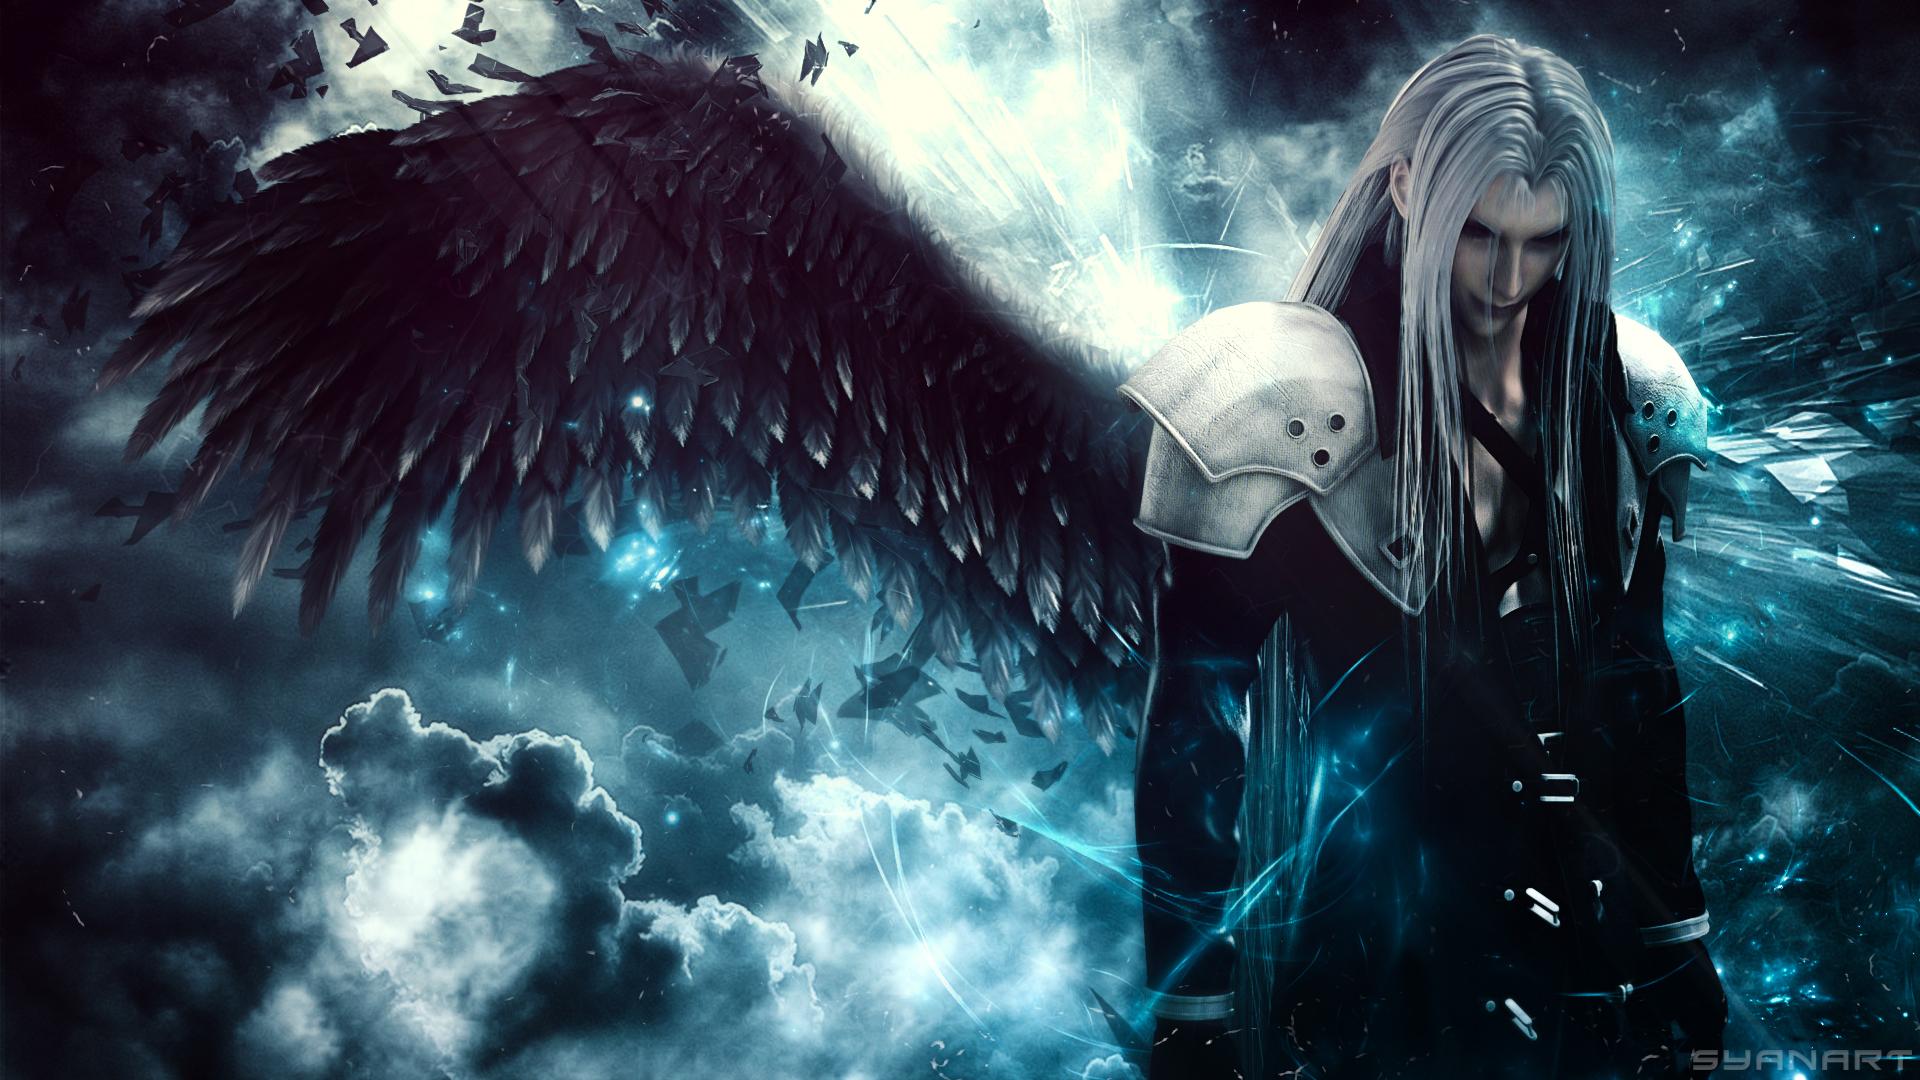 Sephiroth Hd Wallpaper Posted By Samantha Walker